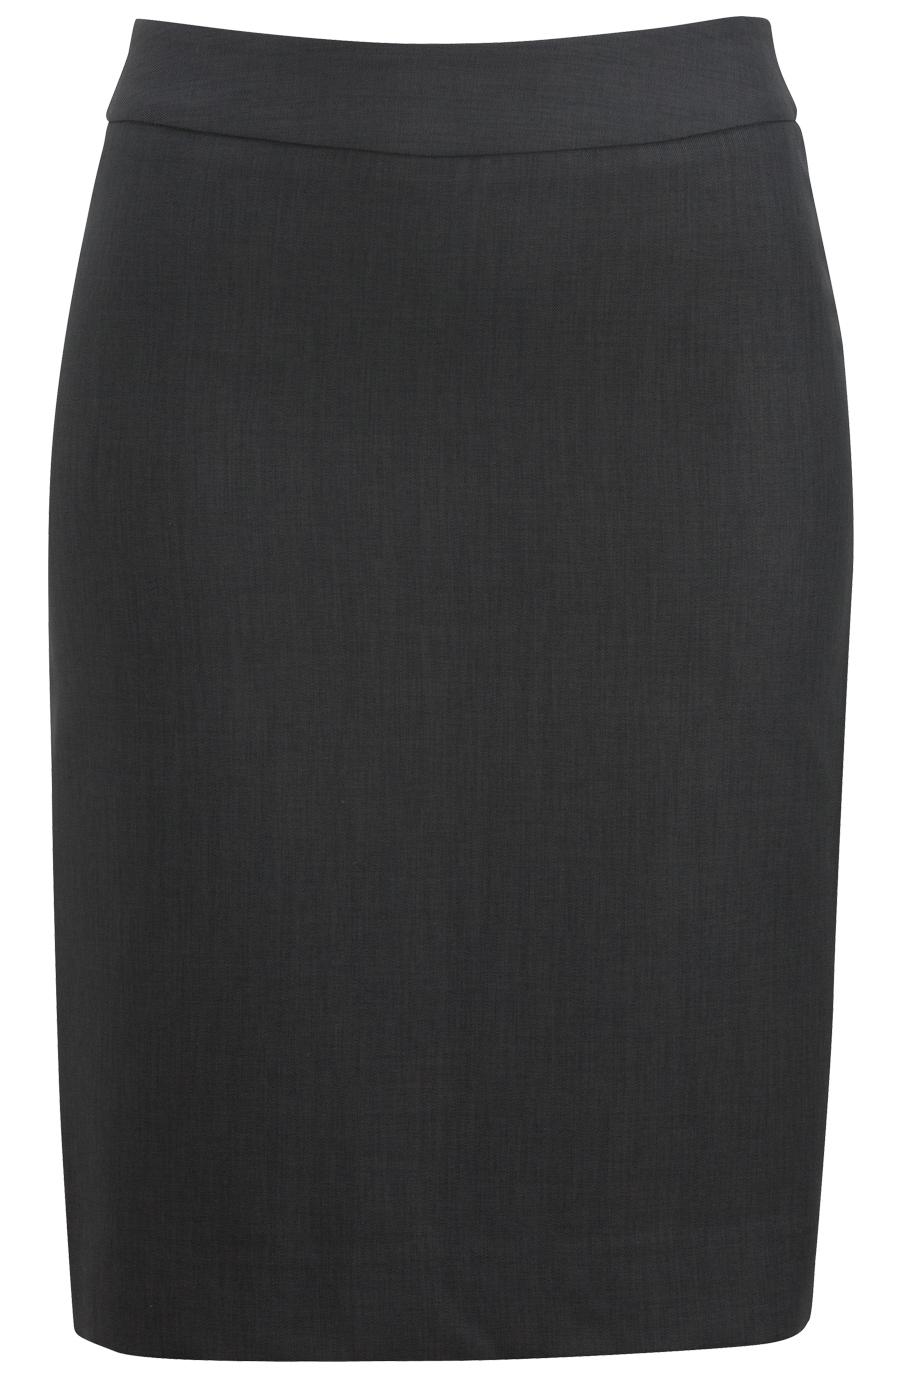 Ladies' Synergy Washable Straight Skirt 9725